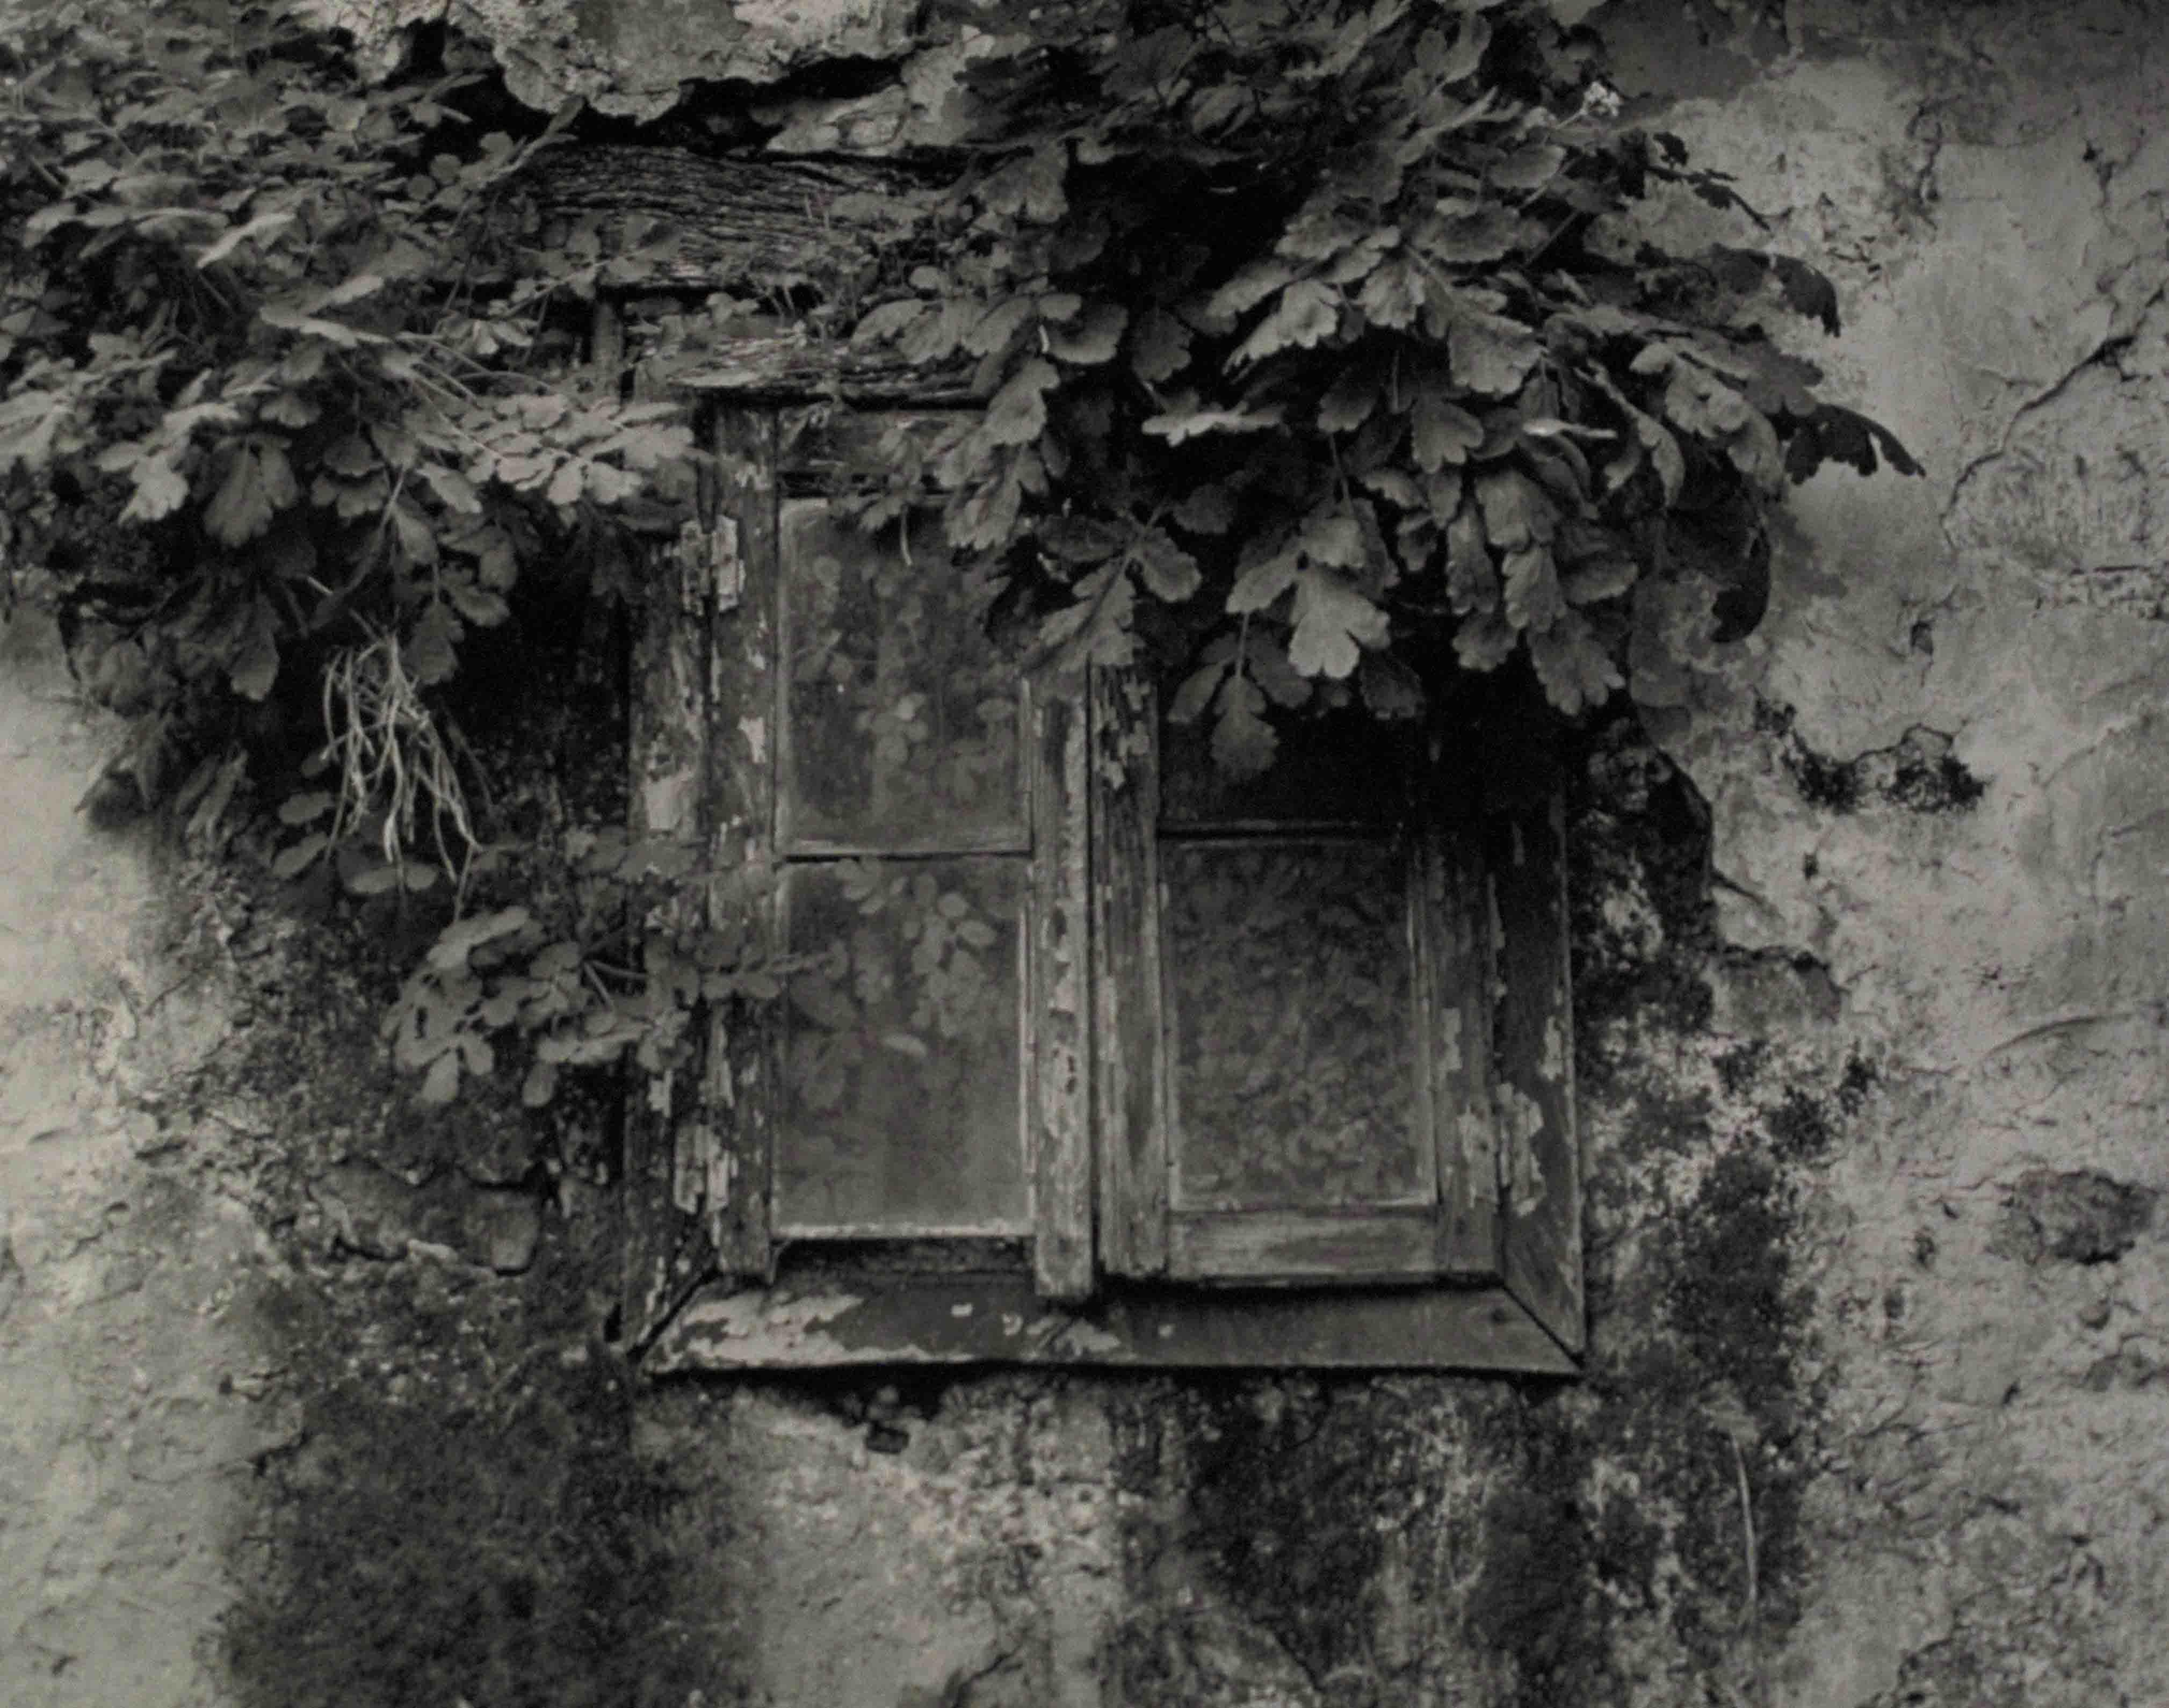 Ma Casanova.  Jardin interior, 2008<br/>Gelatina de plata / Silver gelatin